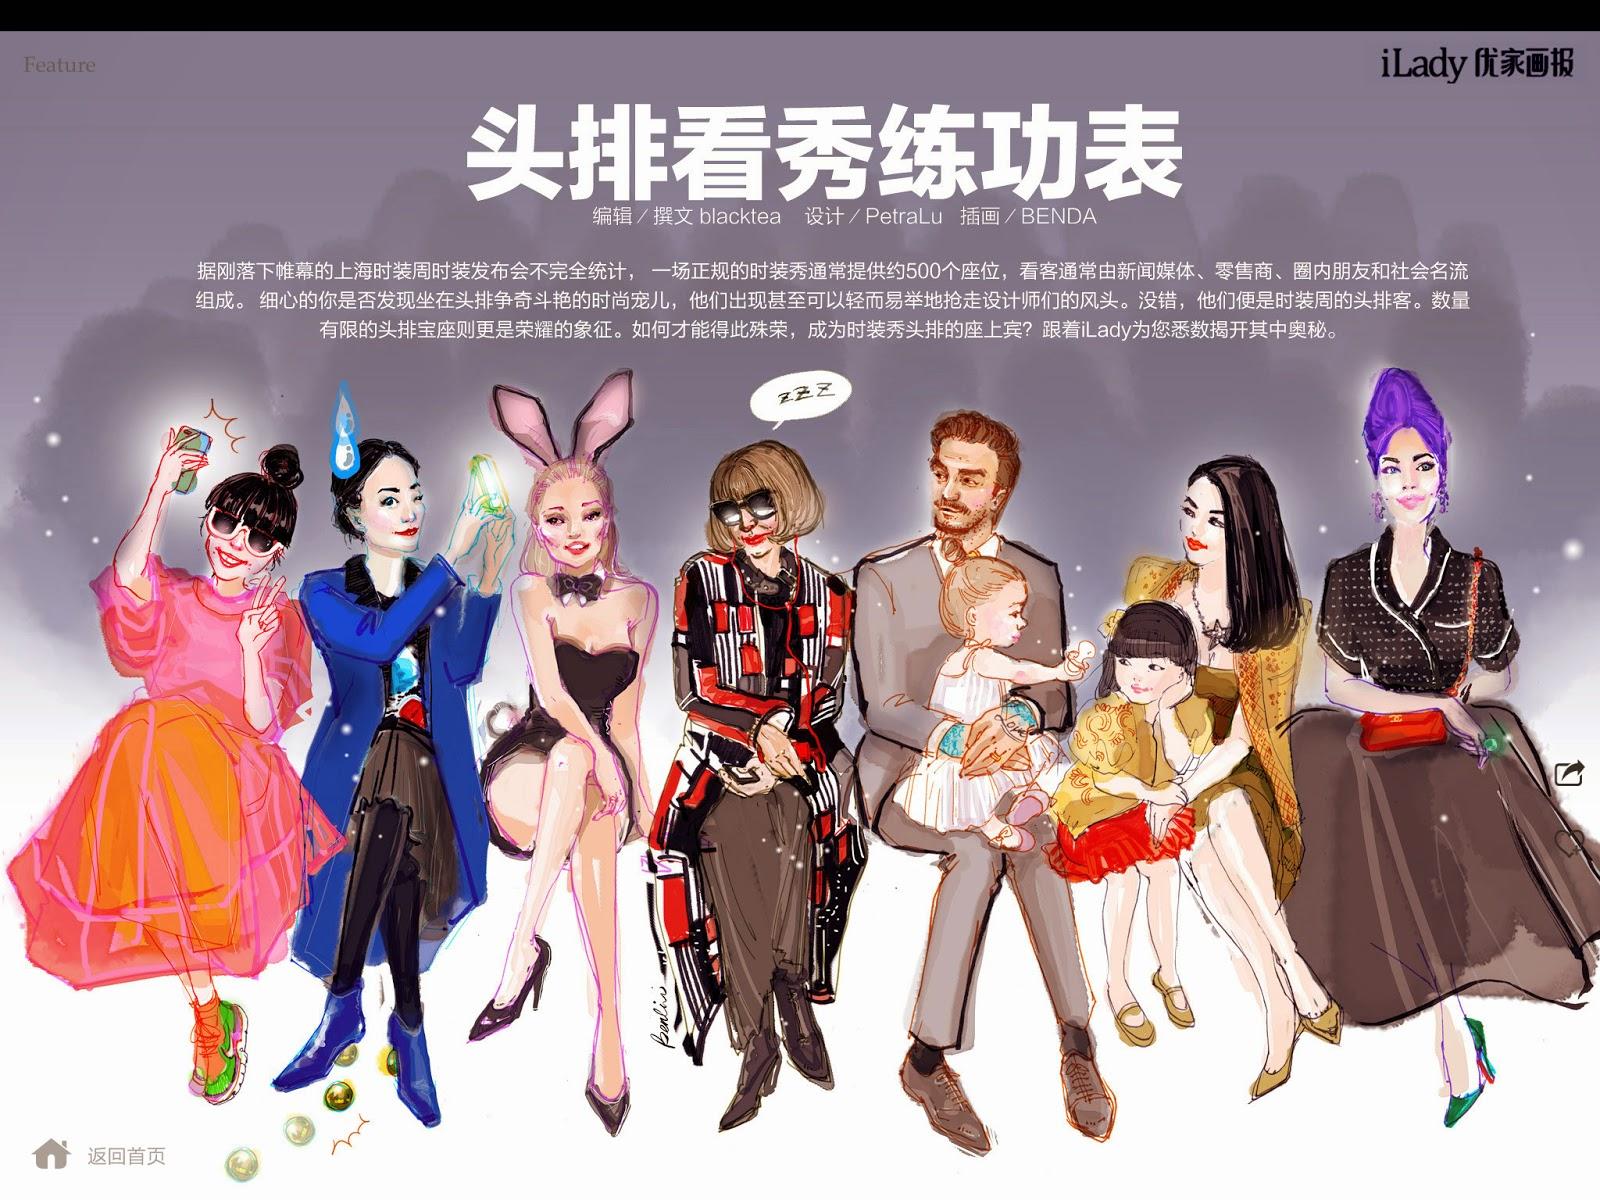 FashionWeek-Front-Row-iLady-magazine-Ben-Liu